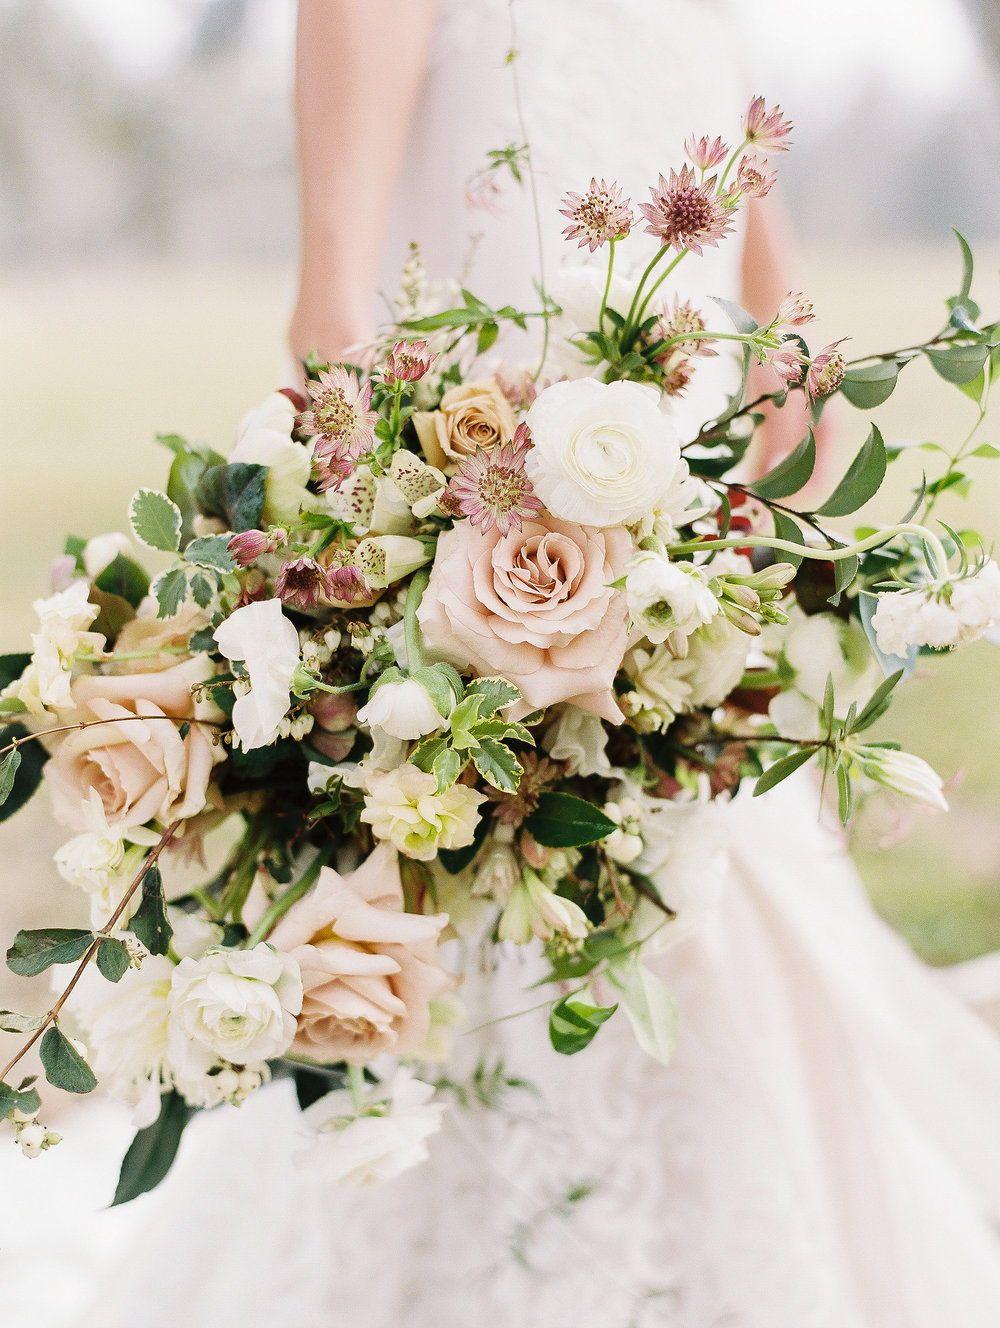 Mountain Elopement Arkansas Wedding Planner Florist Education Zimmerman Wedding Flower Arrangements Wedding Flowers Wedding Bouquets